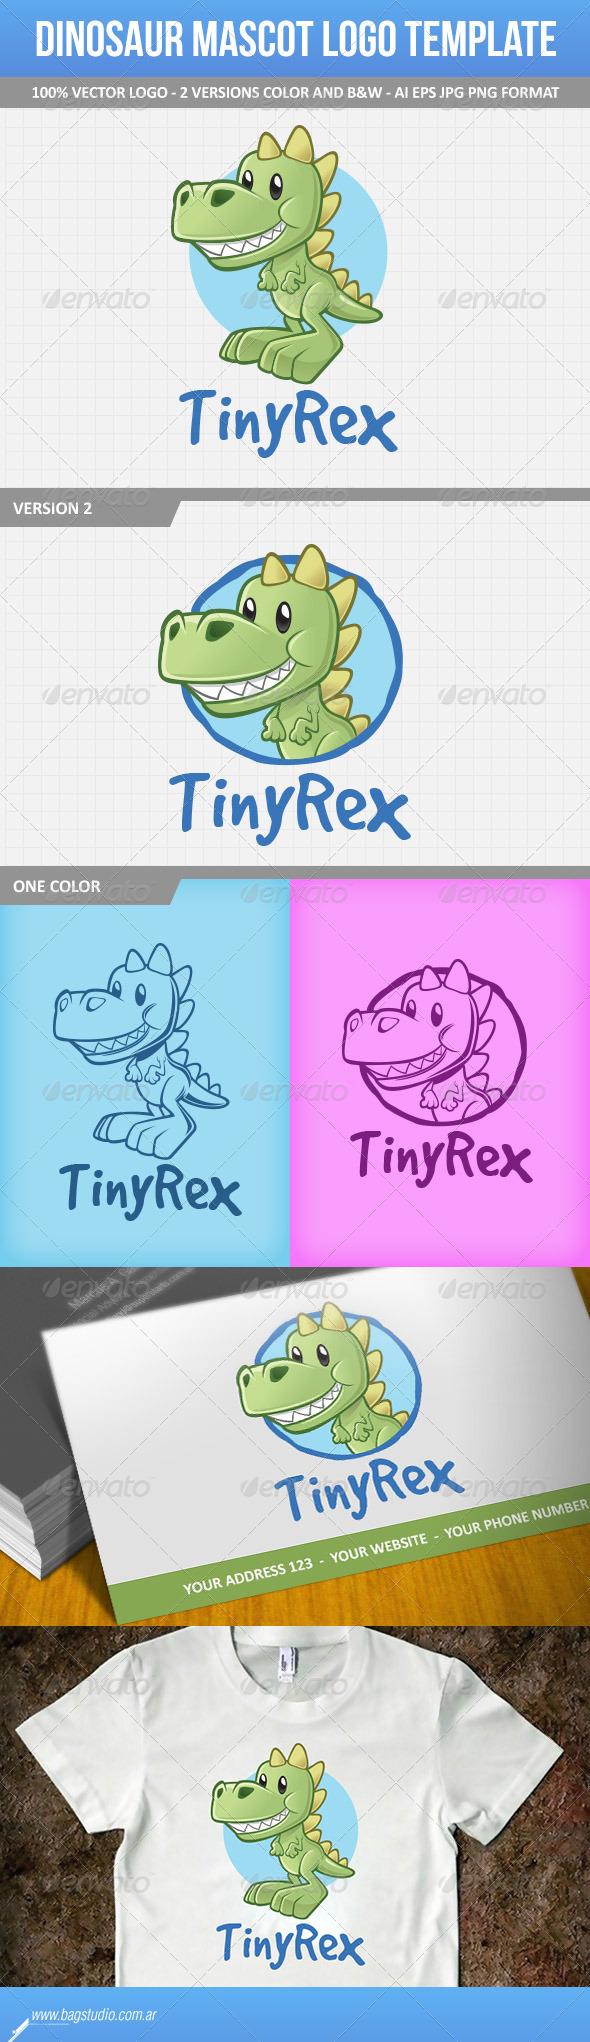 GraphicRiver Dinosaur Mascot Logo Template 7161680